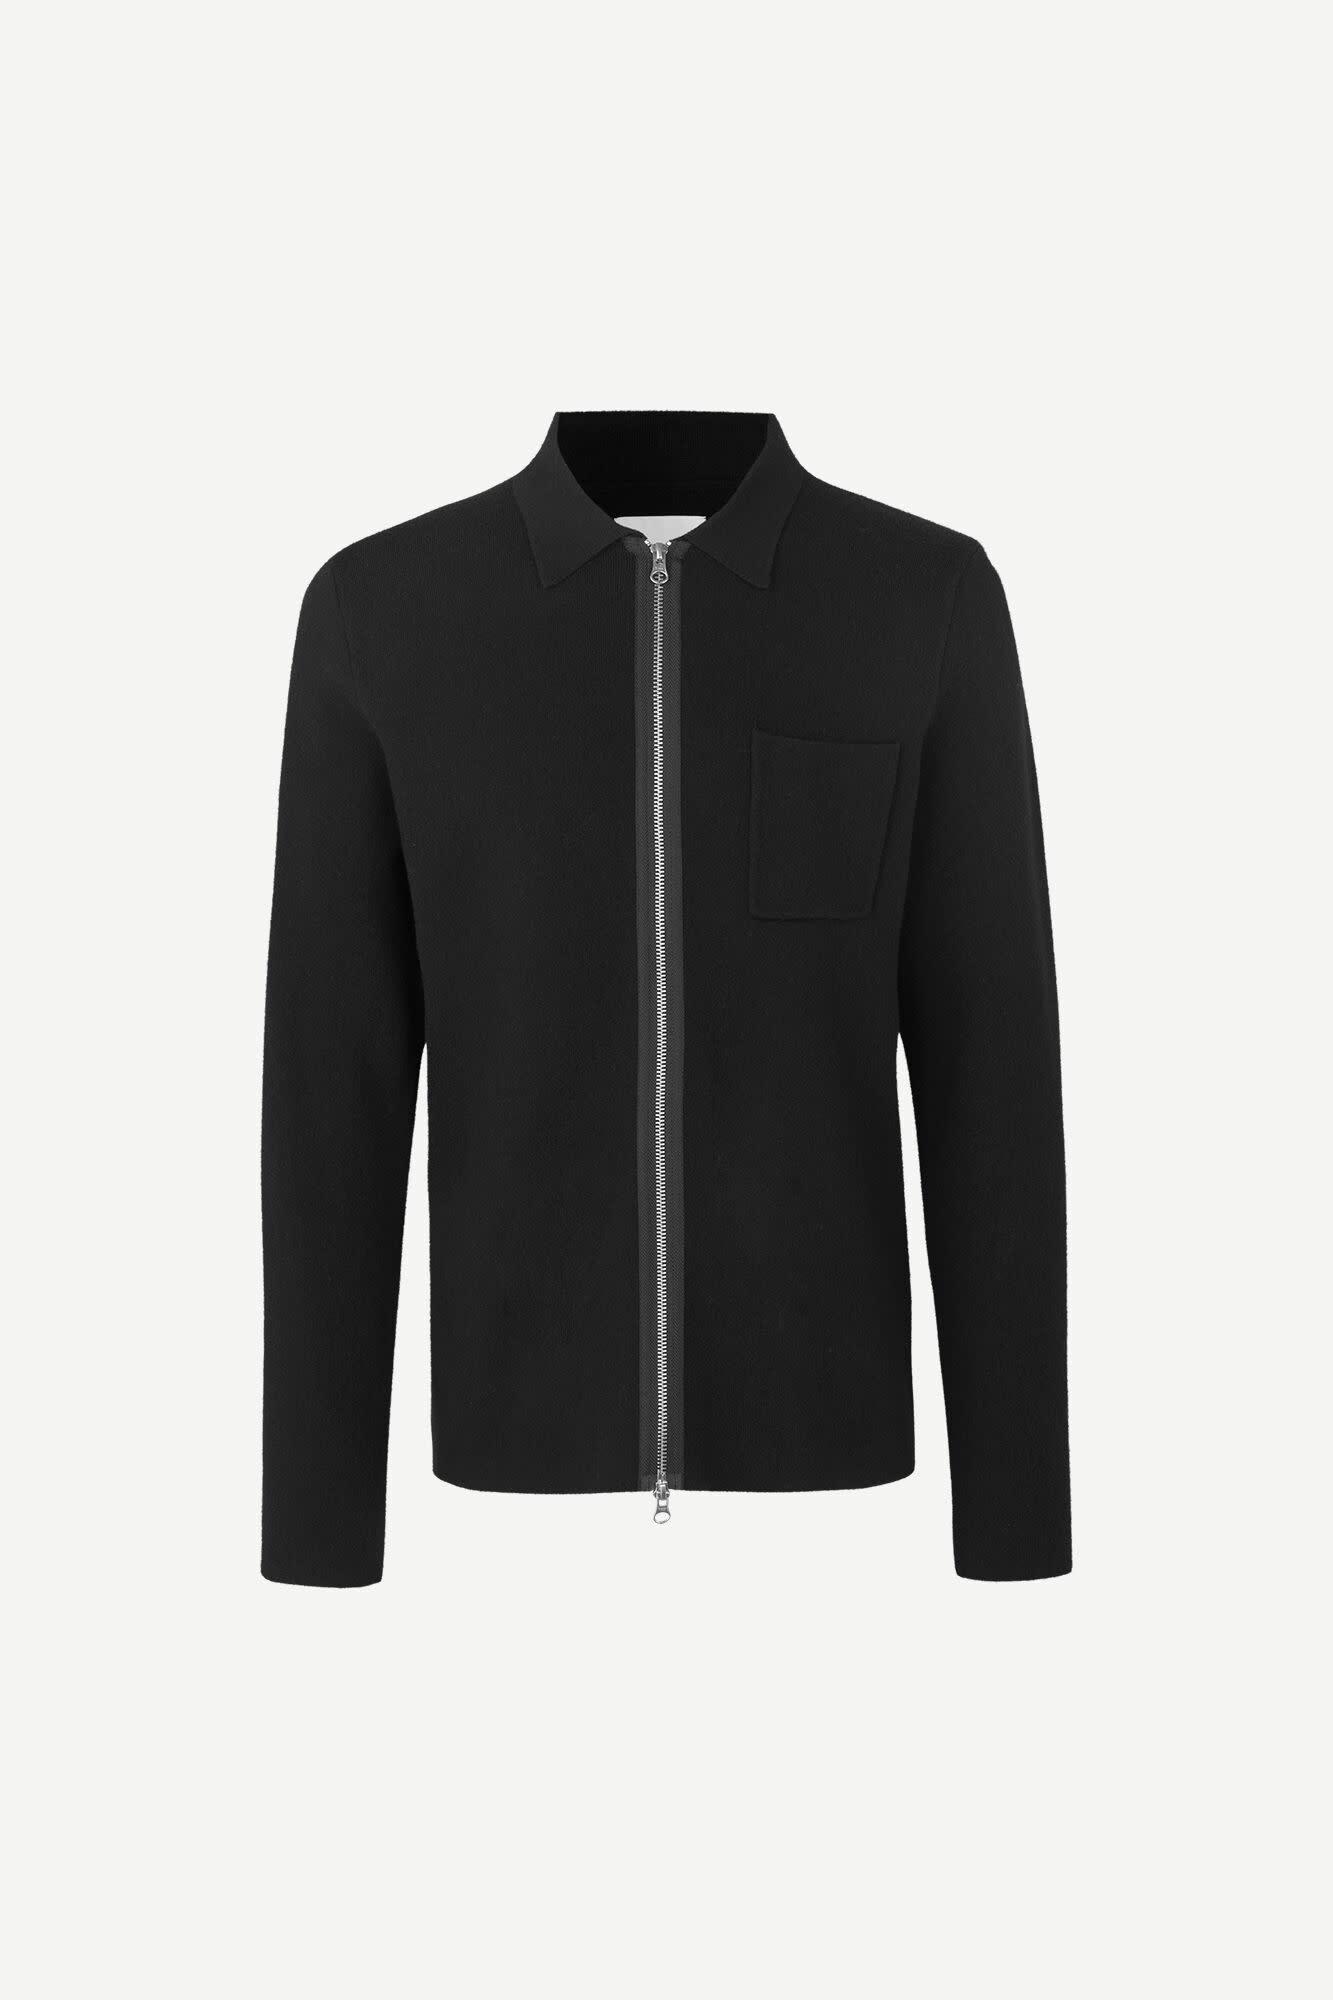 Guna X Zip Knitwear Vest Black 10490-1